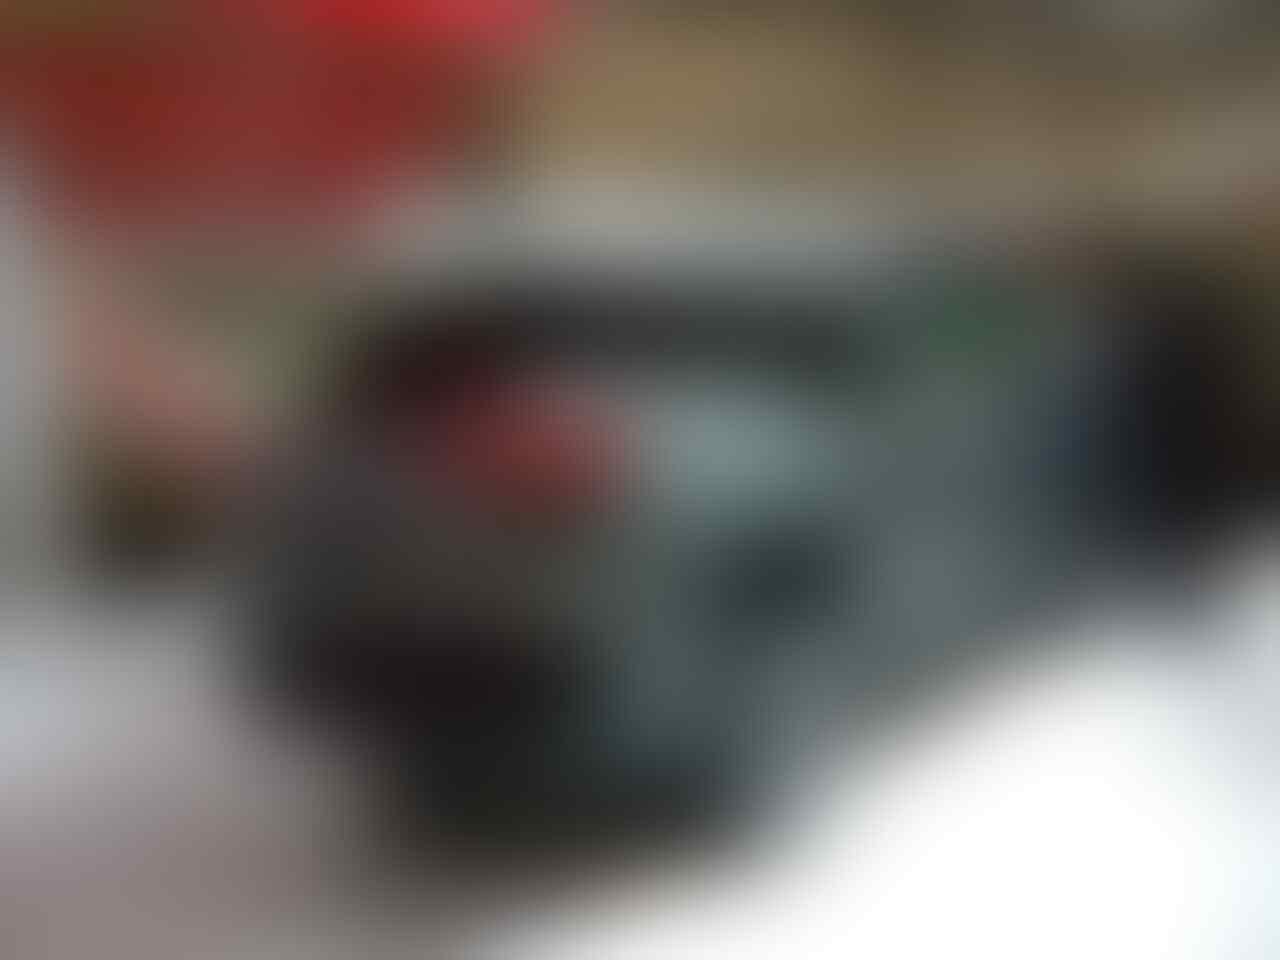 SUV Turbo asal China Baru Mau Menggoyang Rush sampai CR-V